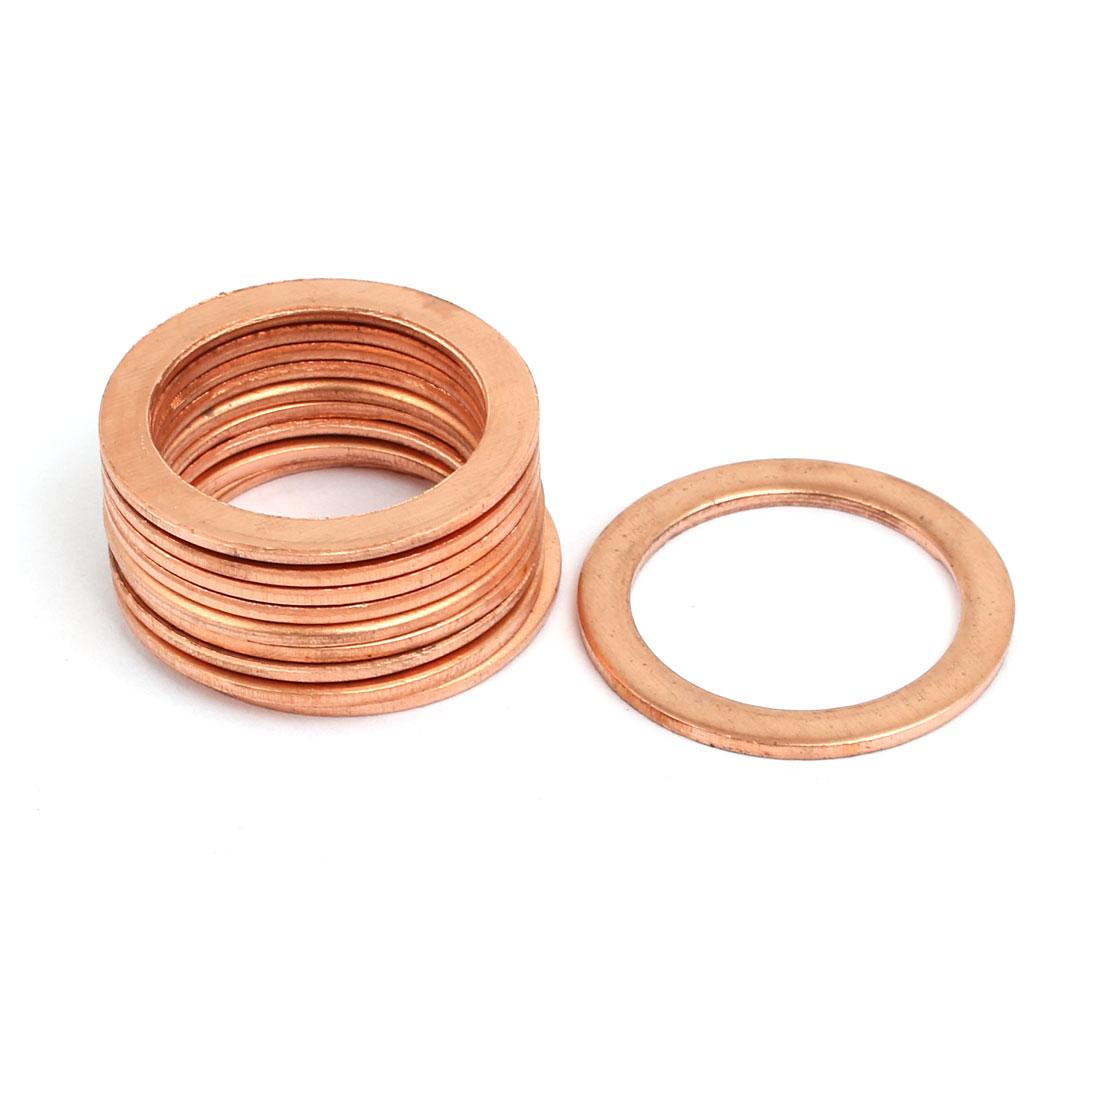 10pcs 22mmx30mmx1.5mm Copper Flat Ring Sealing Crush Washer Gasket